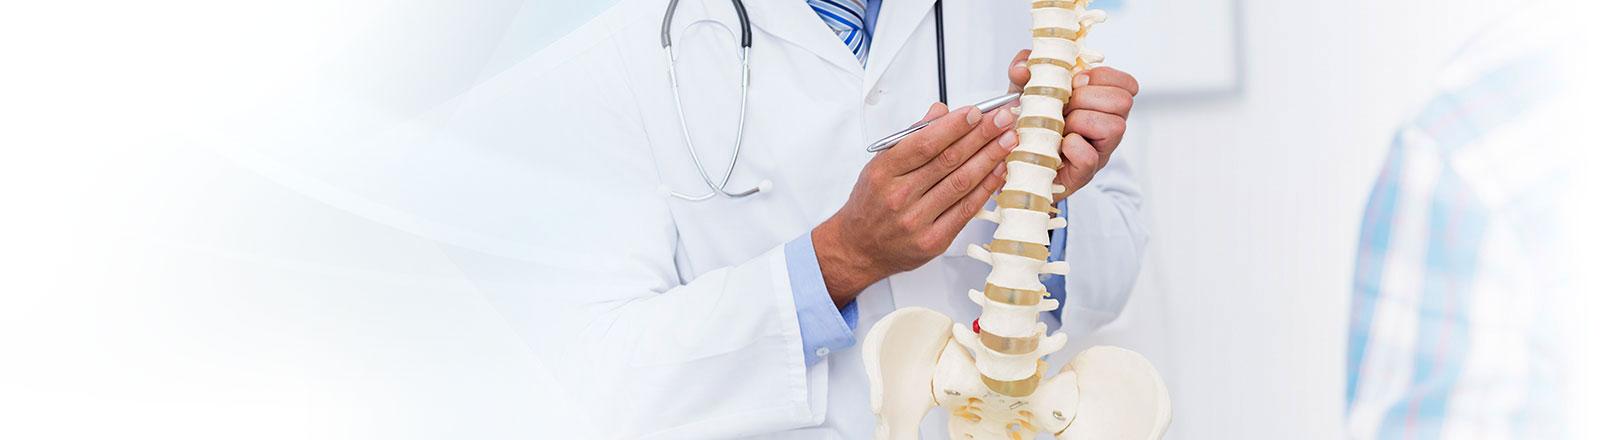 Chiropractic-Medicine-Image